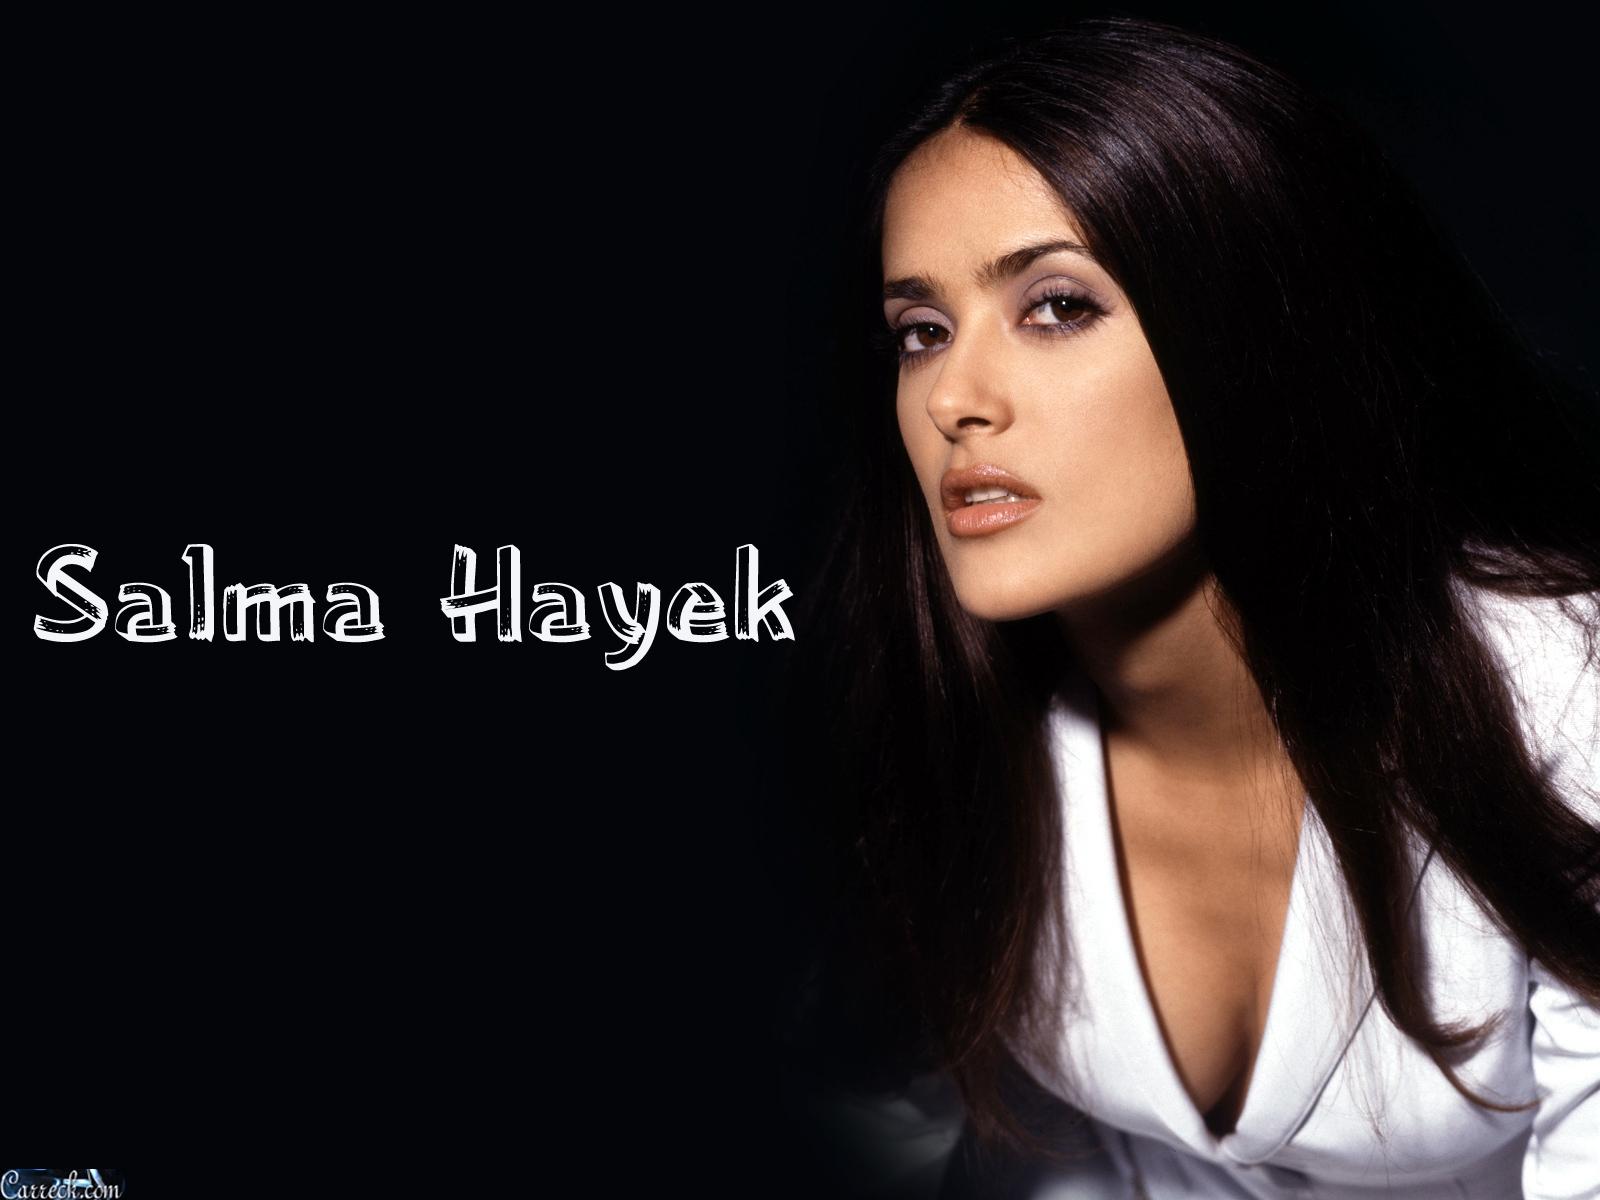 http://2.bp.blogspot.com/-n1WF2J_9OKQ/T6BhjmwR9lI/AAAAAAAACd4/5QMDfoKfBC8/s1600/Salma+Hayek+wallpapers+6.jpg